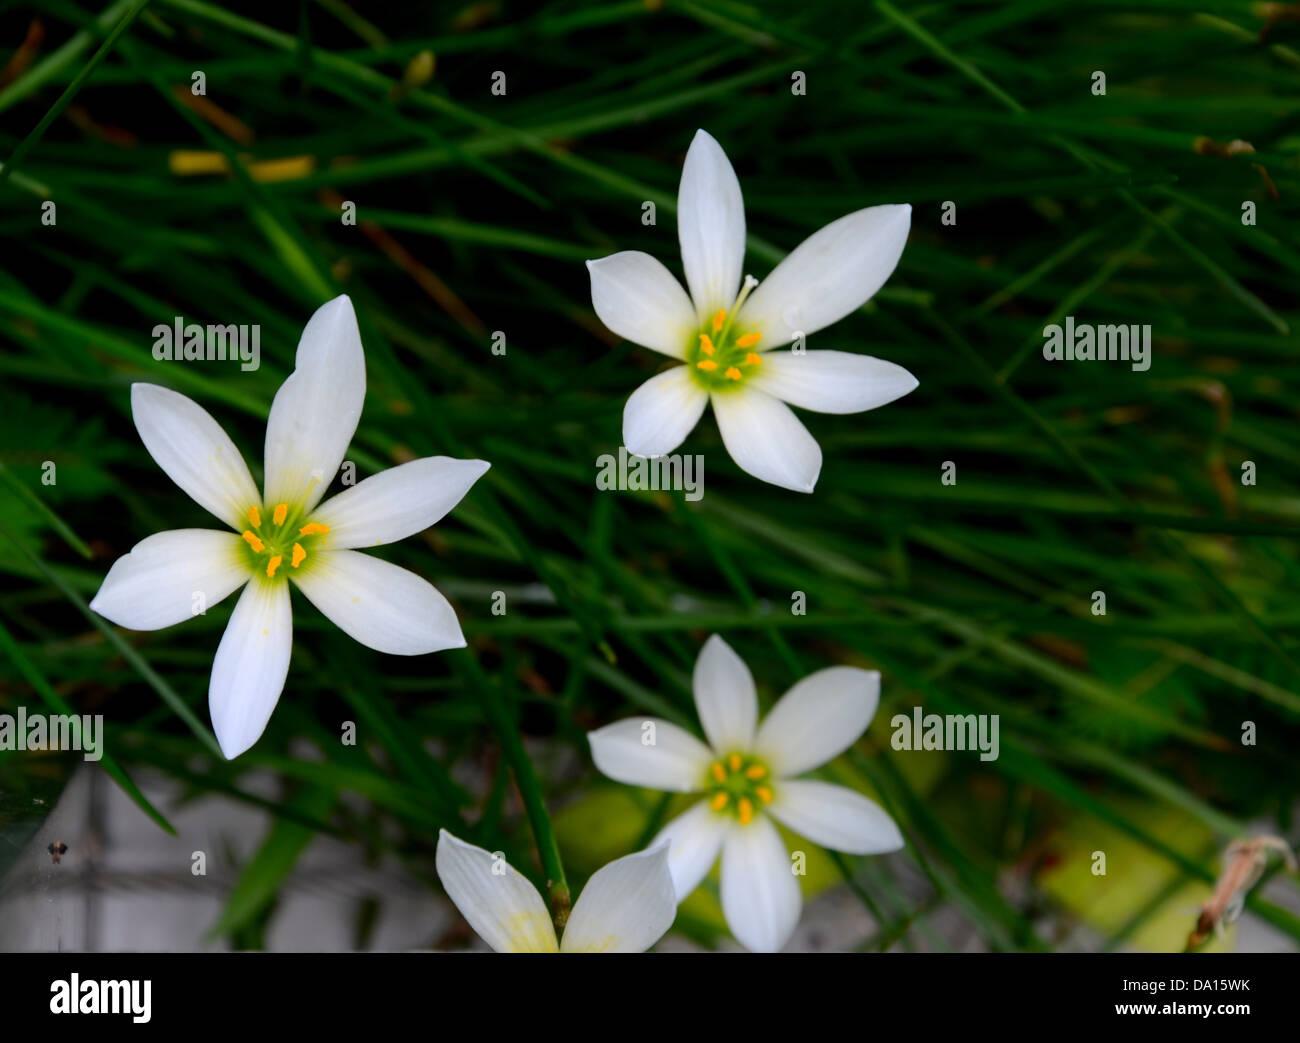 Several White Rain Lily Flowers Stock Photo 57804255 Alamy